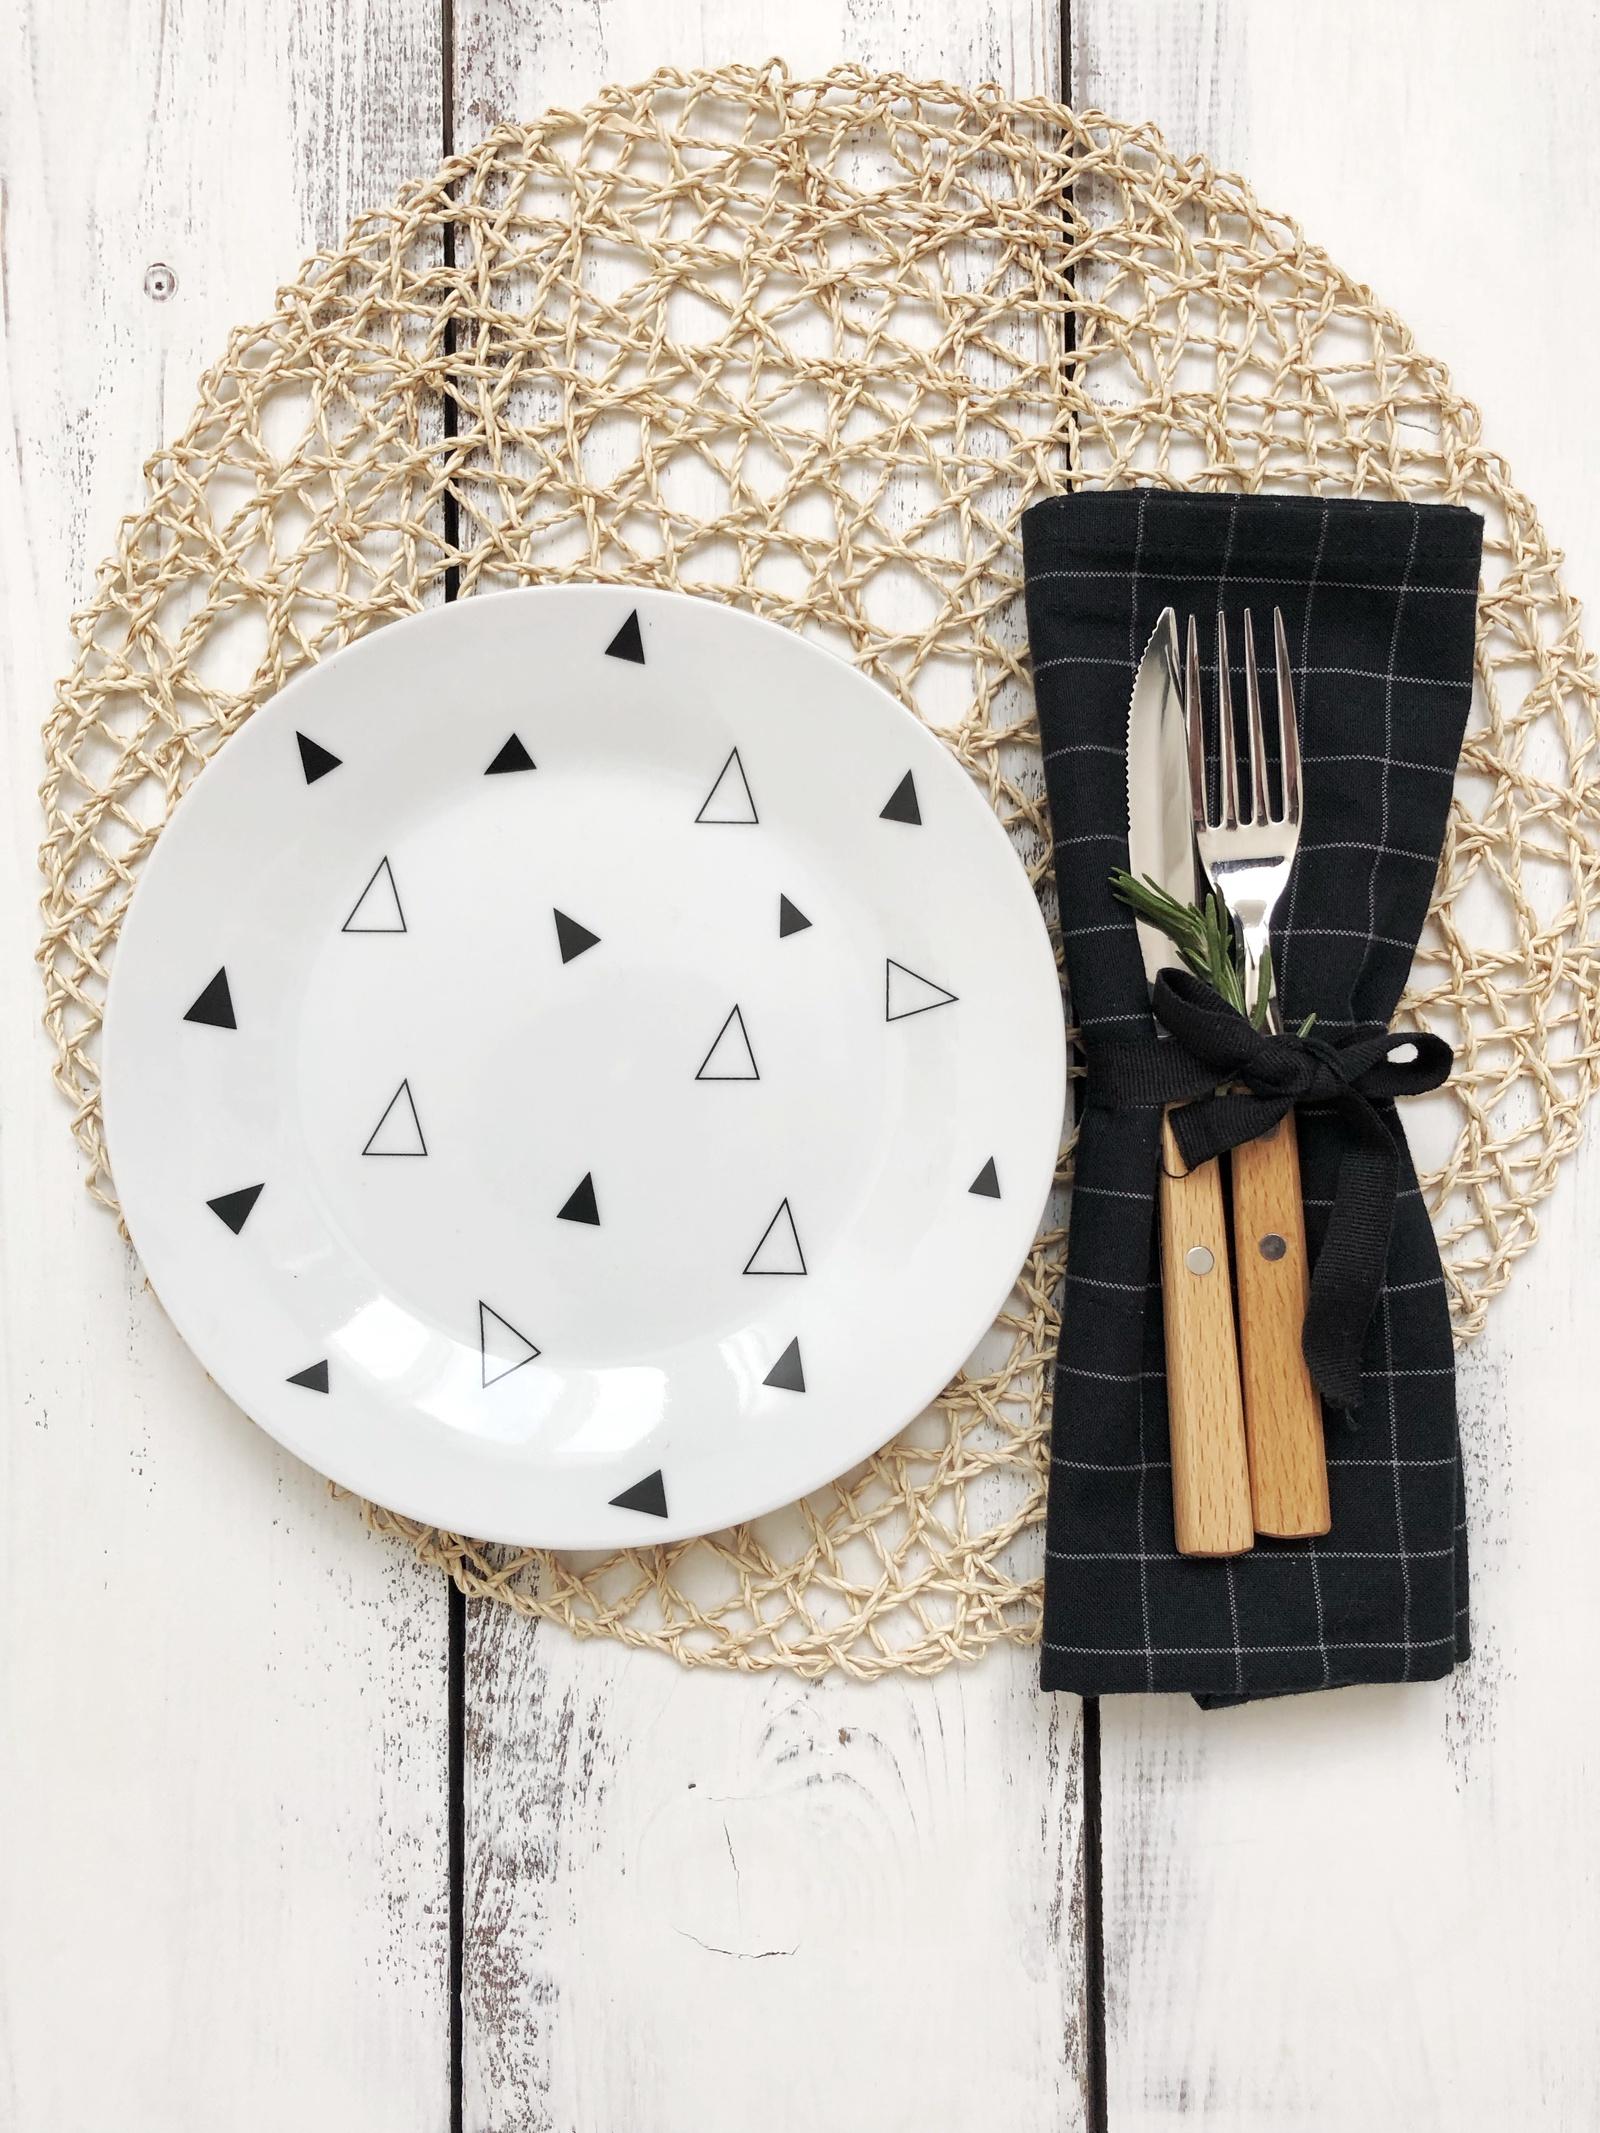 Тарелка Сотвори Чудо Треугольник 20 см, белый тарелка мелкая сотвори чудо бантик sans brides диаметр 20 см